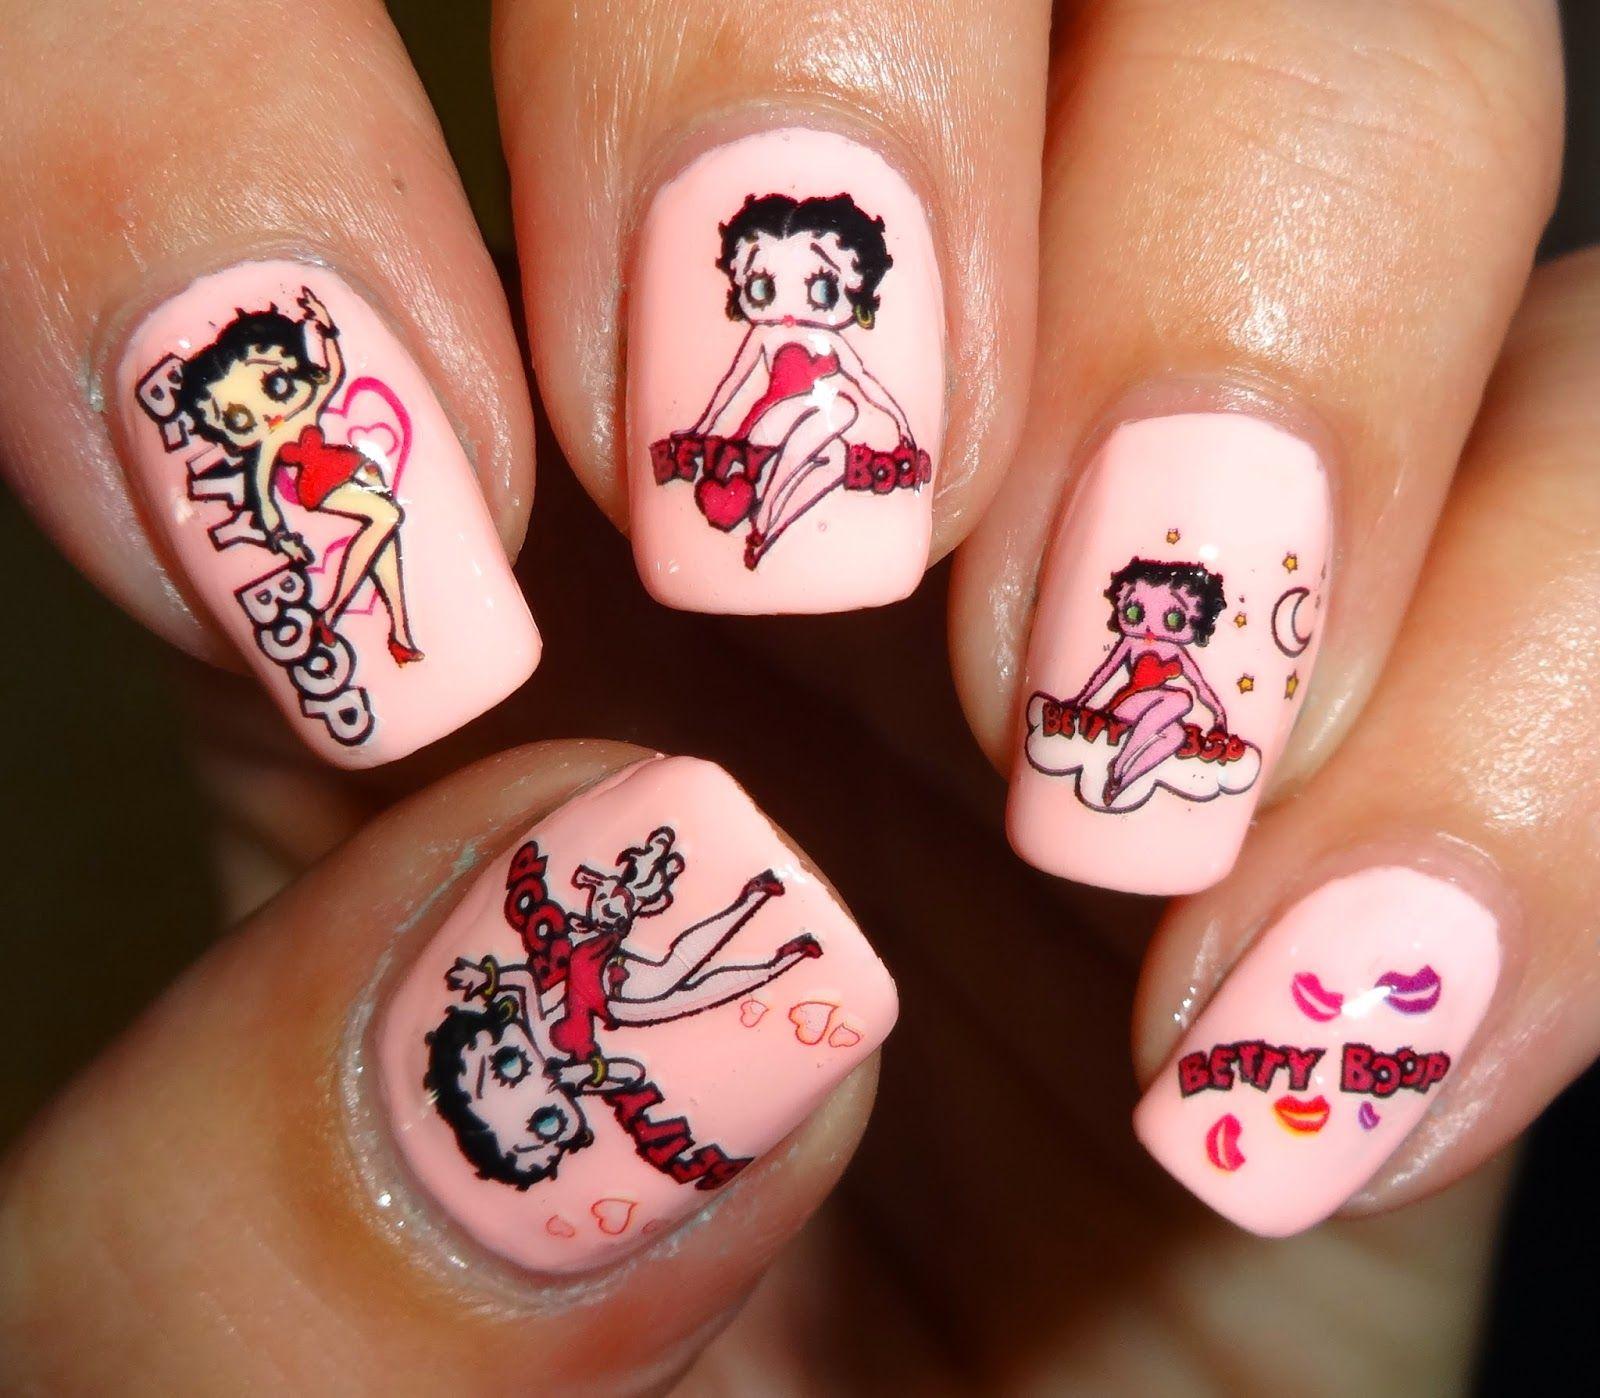 Betty Boop Nails: Wendy's Delights: KKCenterHk Kiss Moon Betty Boop Water